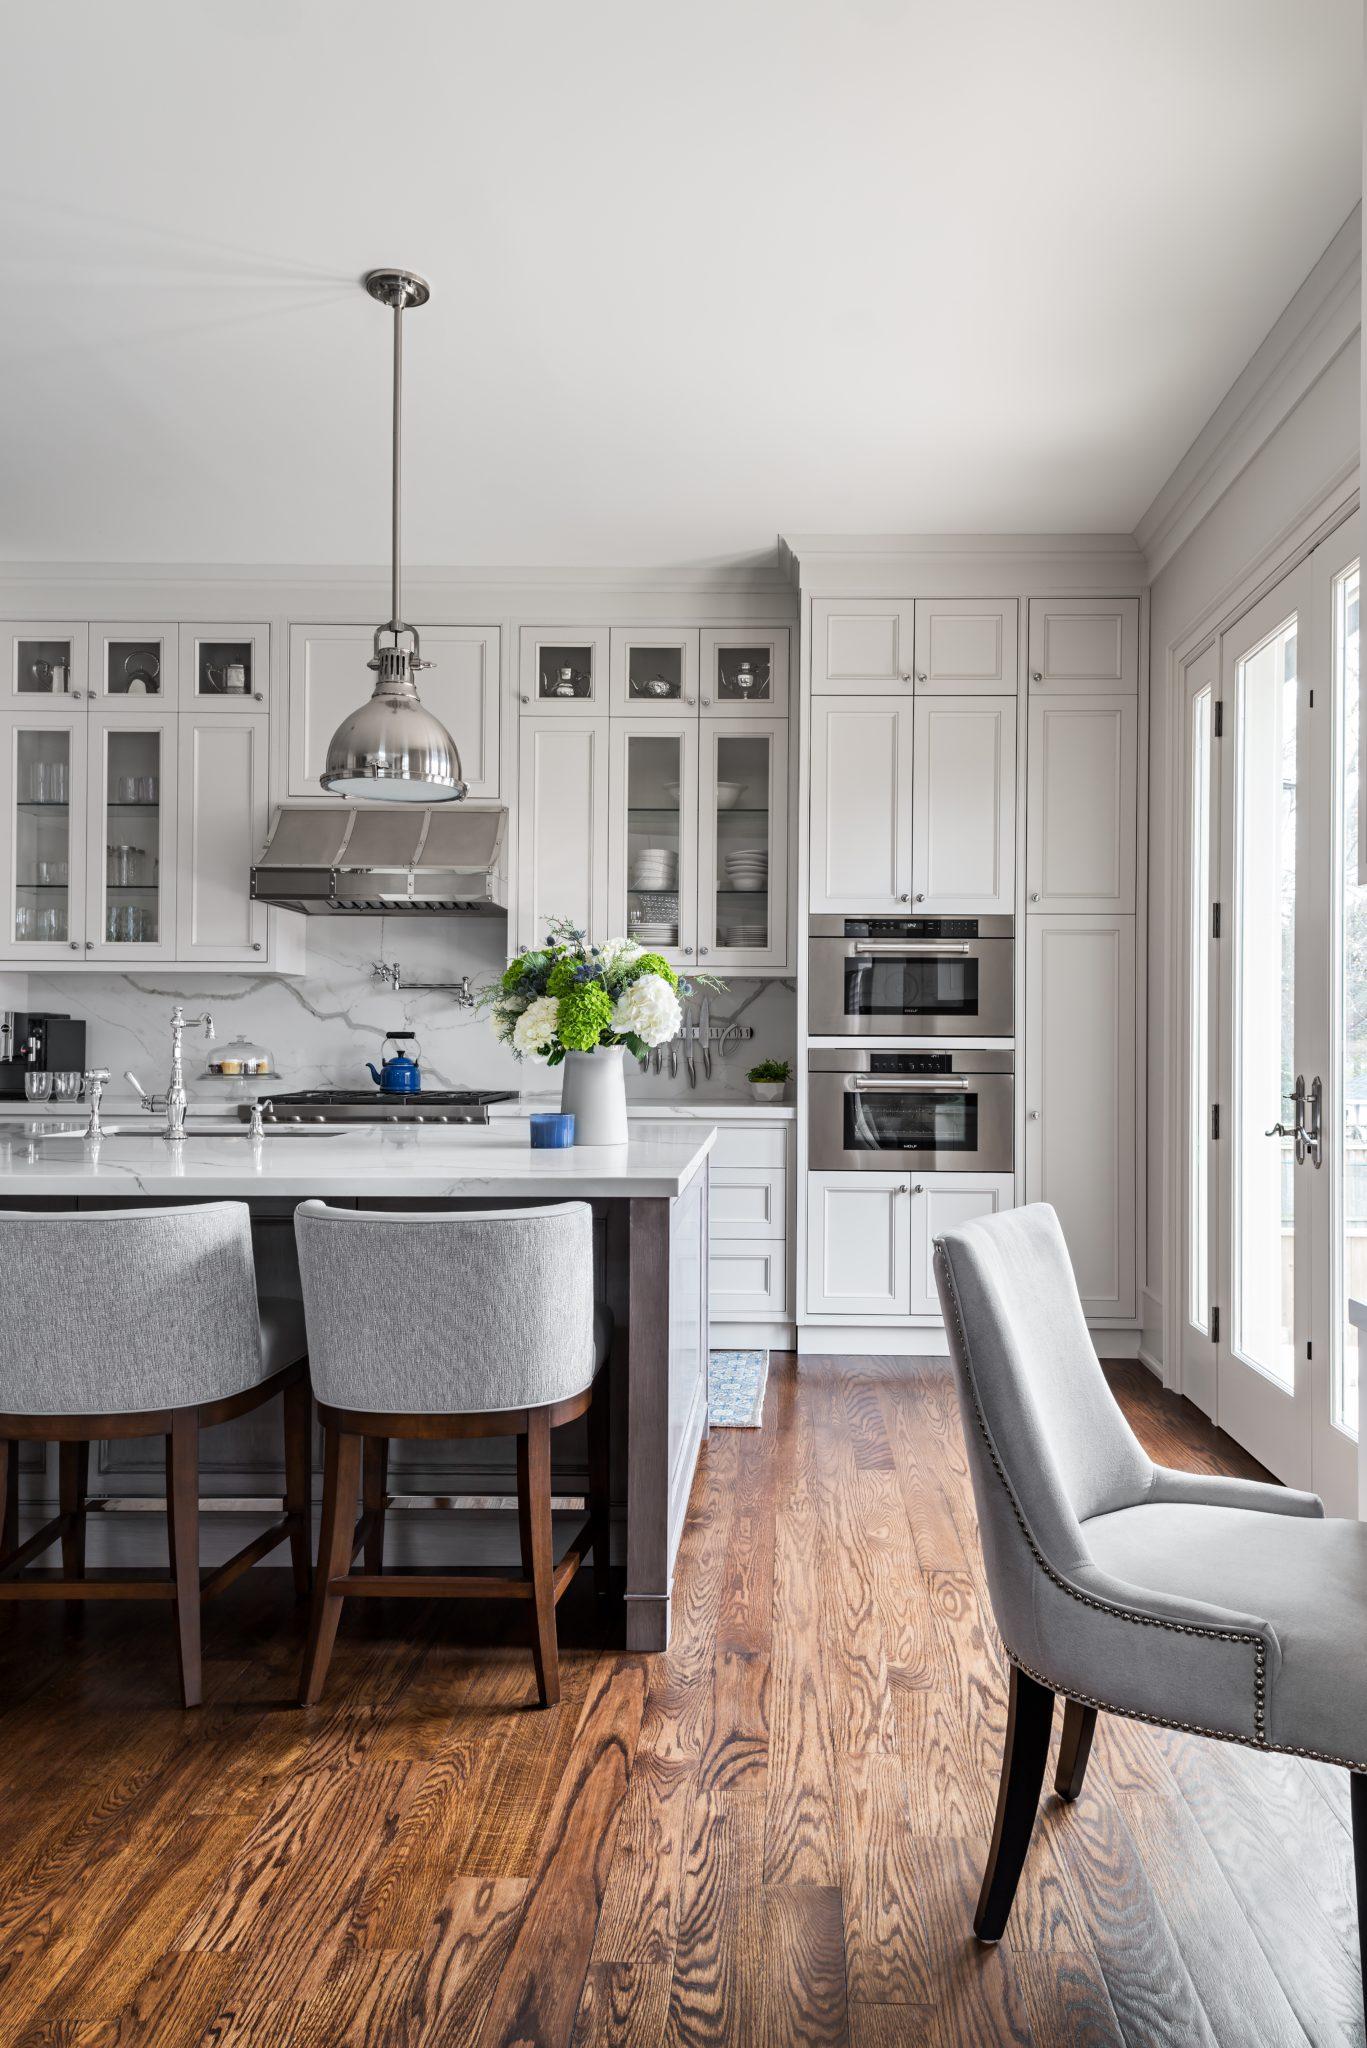 Crestwood custom kitchen by Sheree Stuart Design